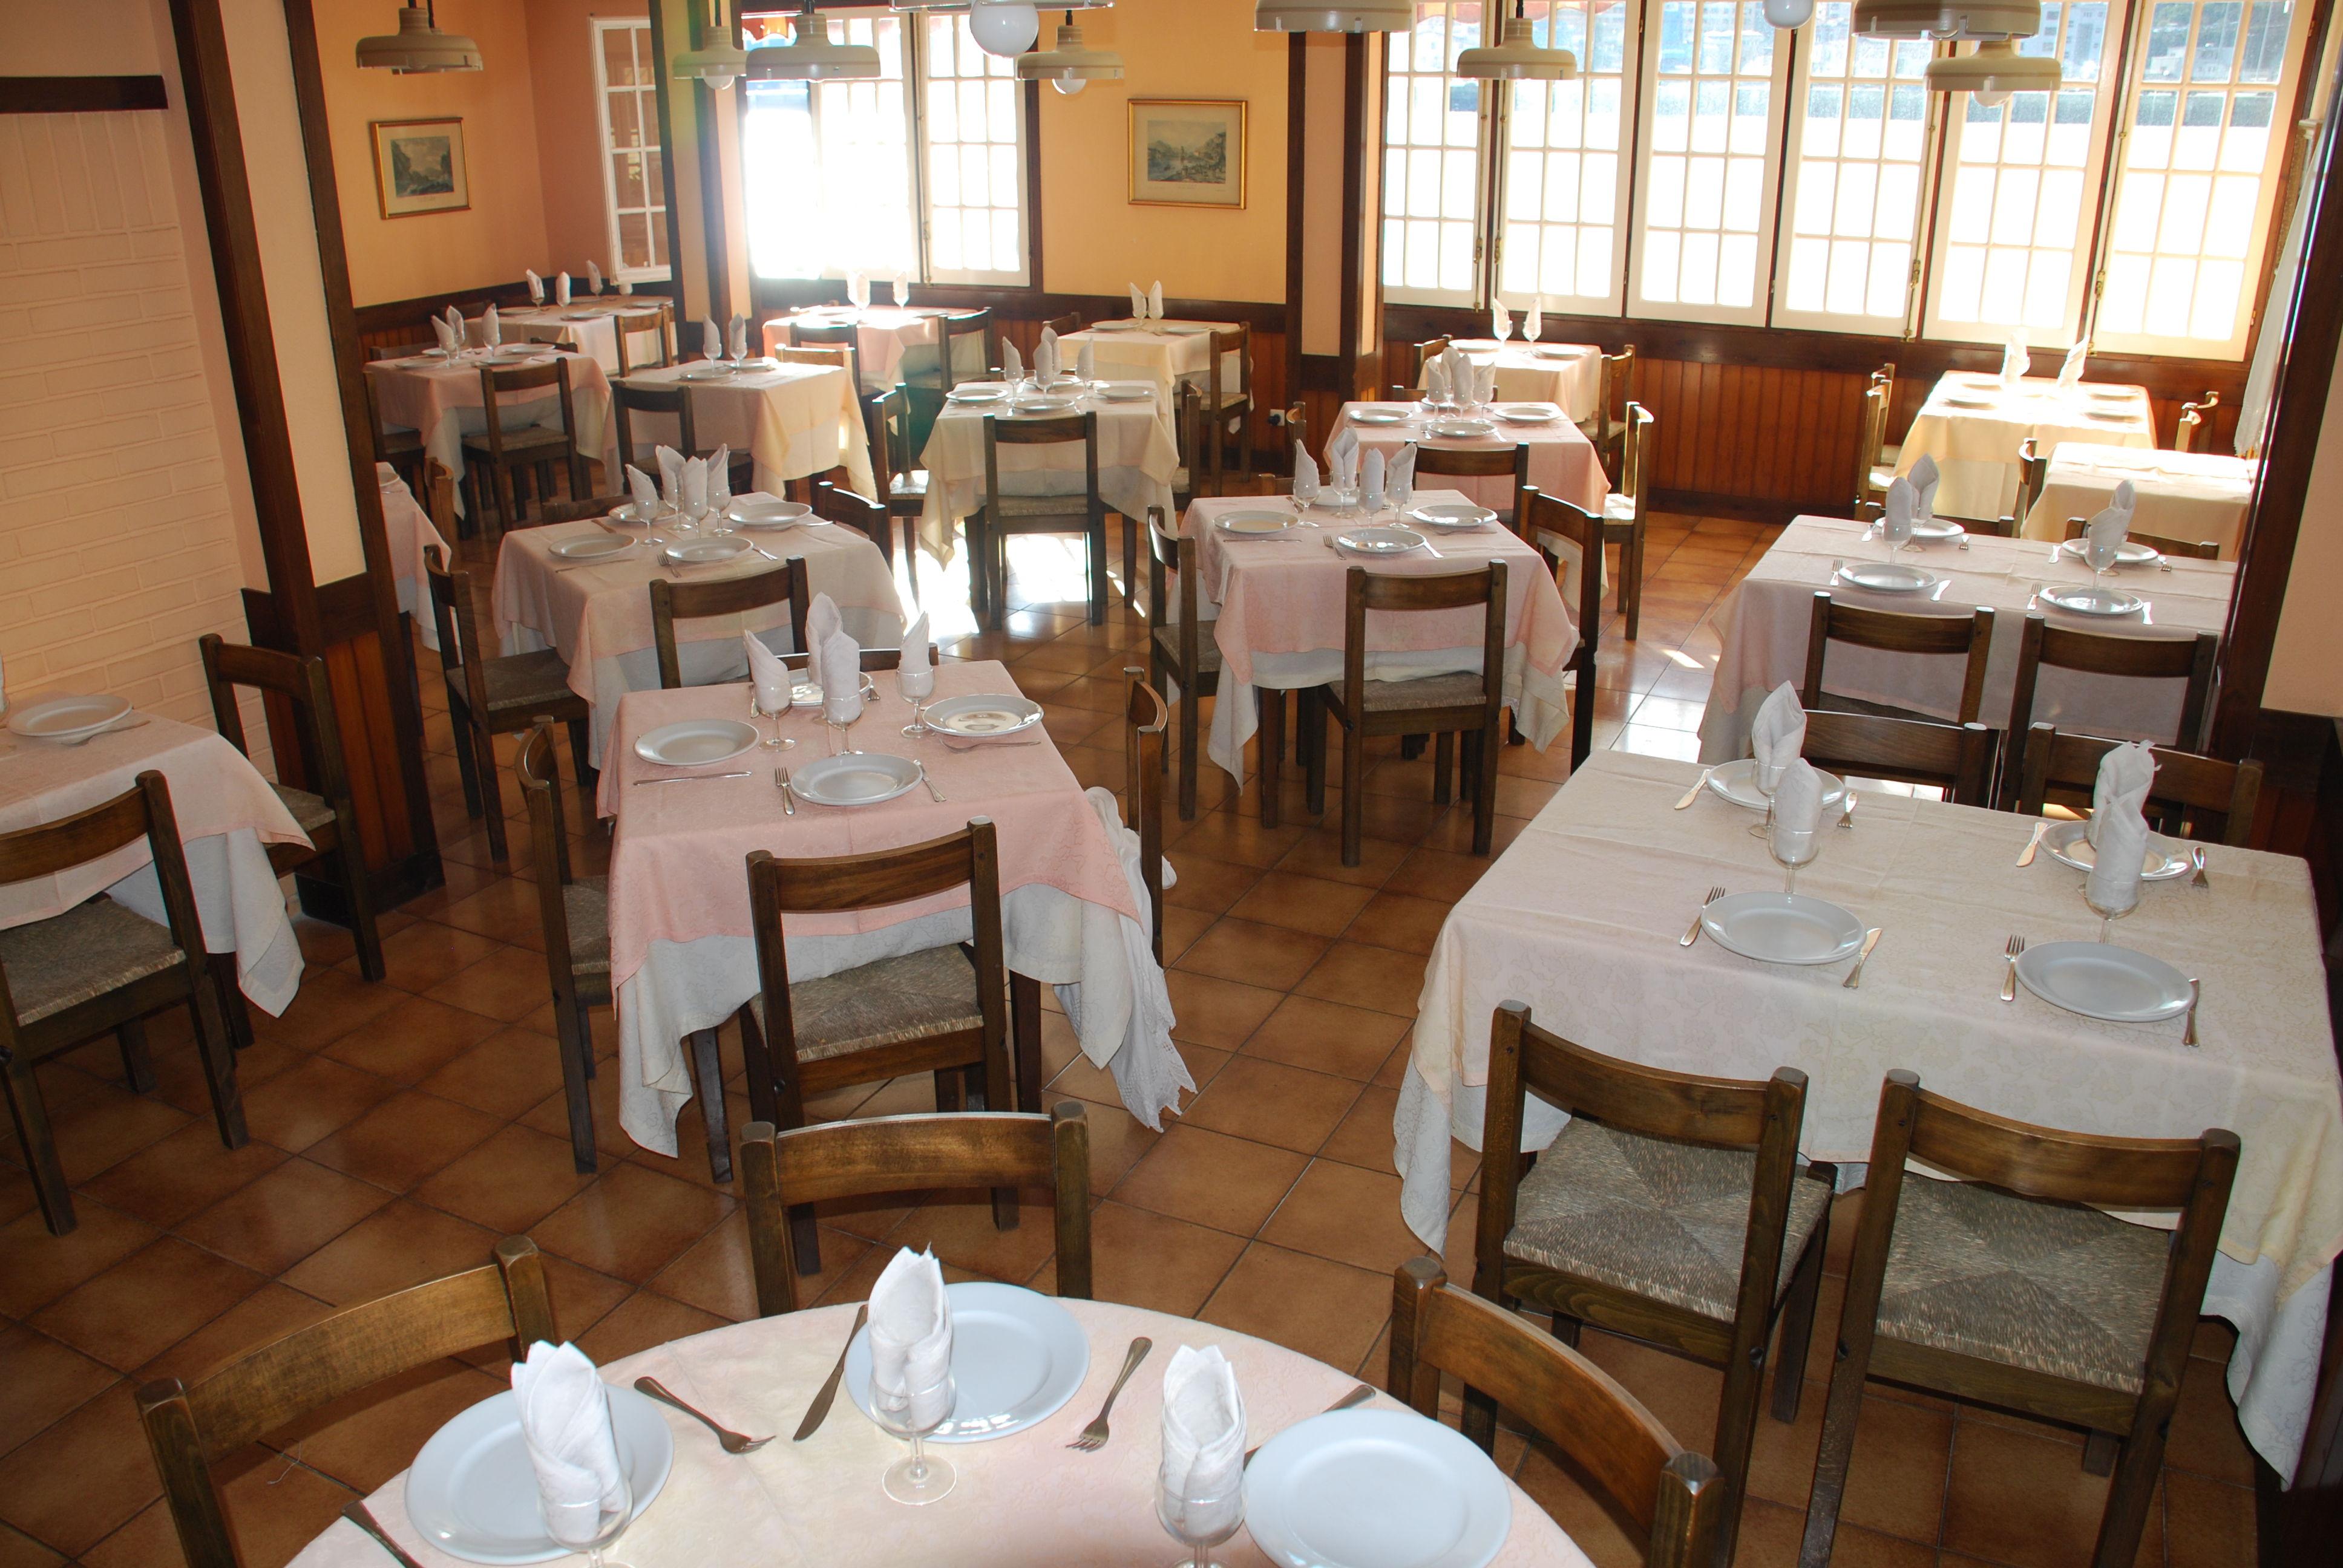 Foto 8 de Cocina vasca en Pasajes San Juan | Restaurante Nicolasa